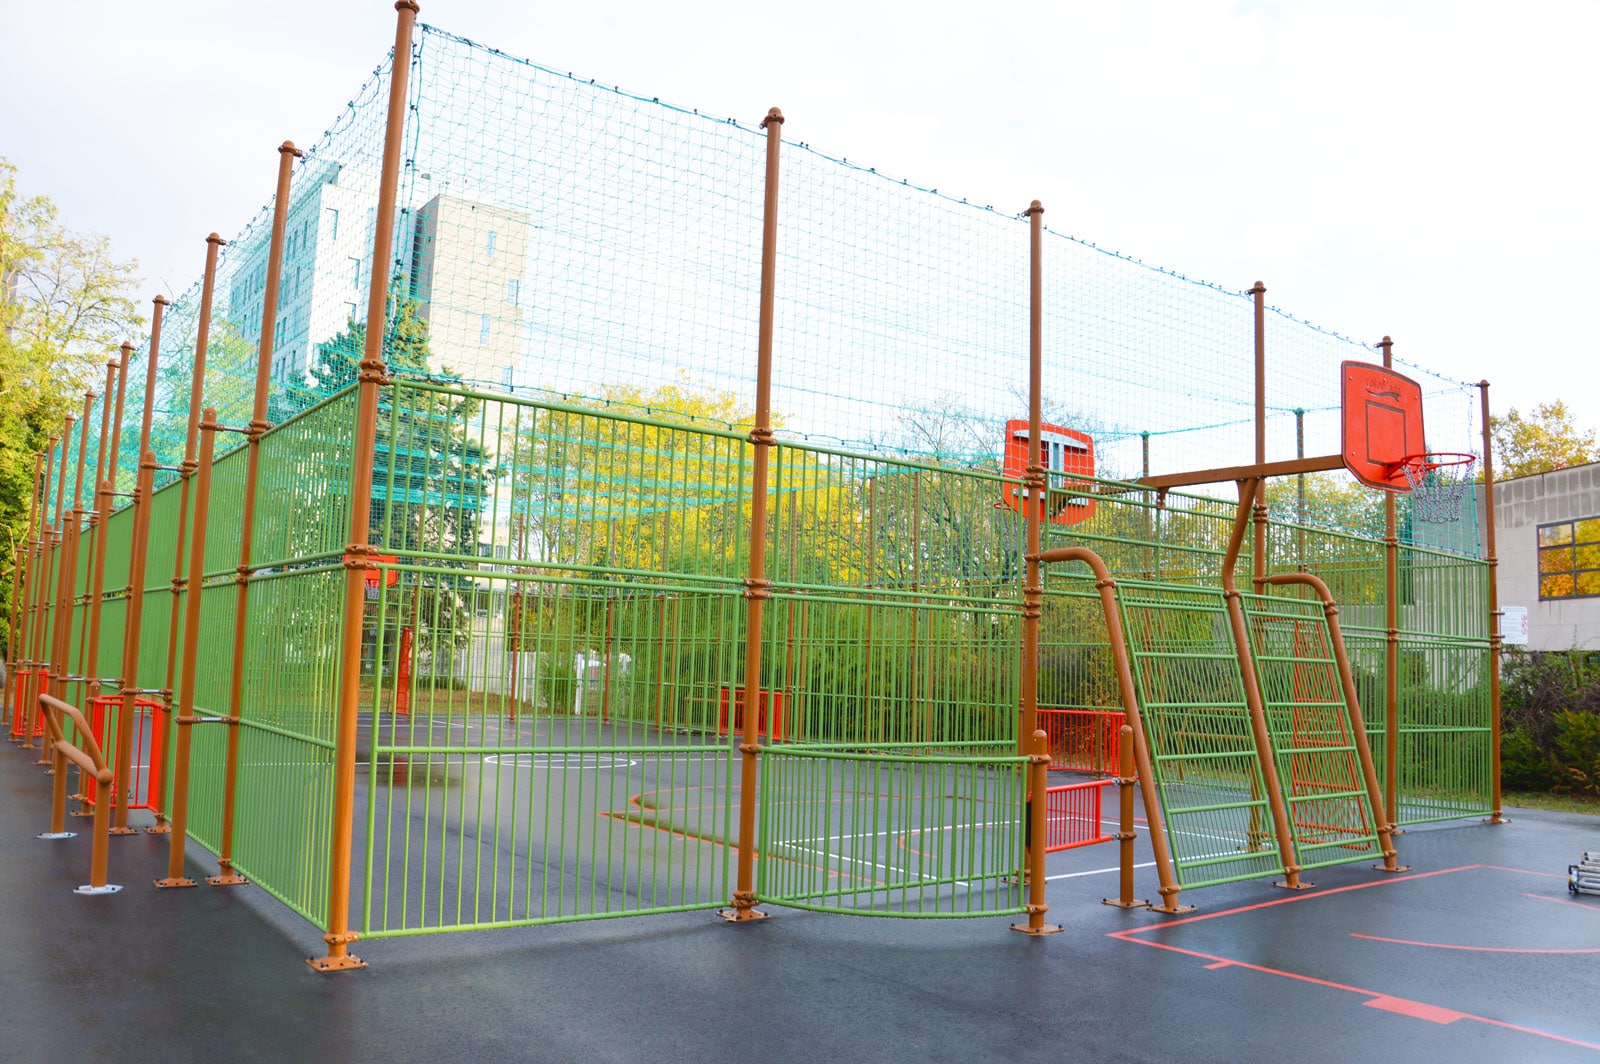 Aire de jeux Multisport Street Workout à Bobigny Square Hector Berlioz